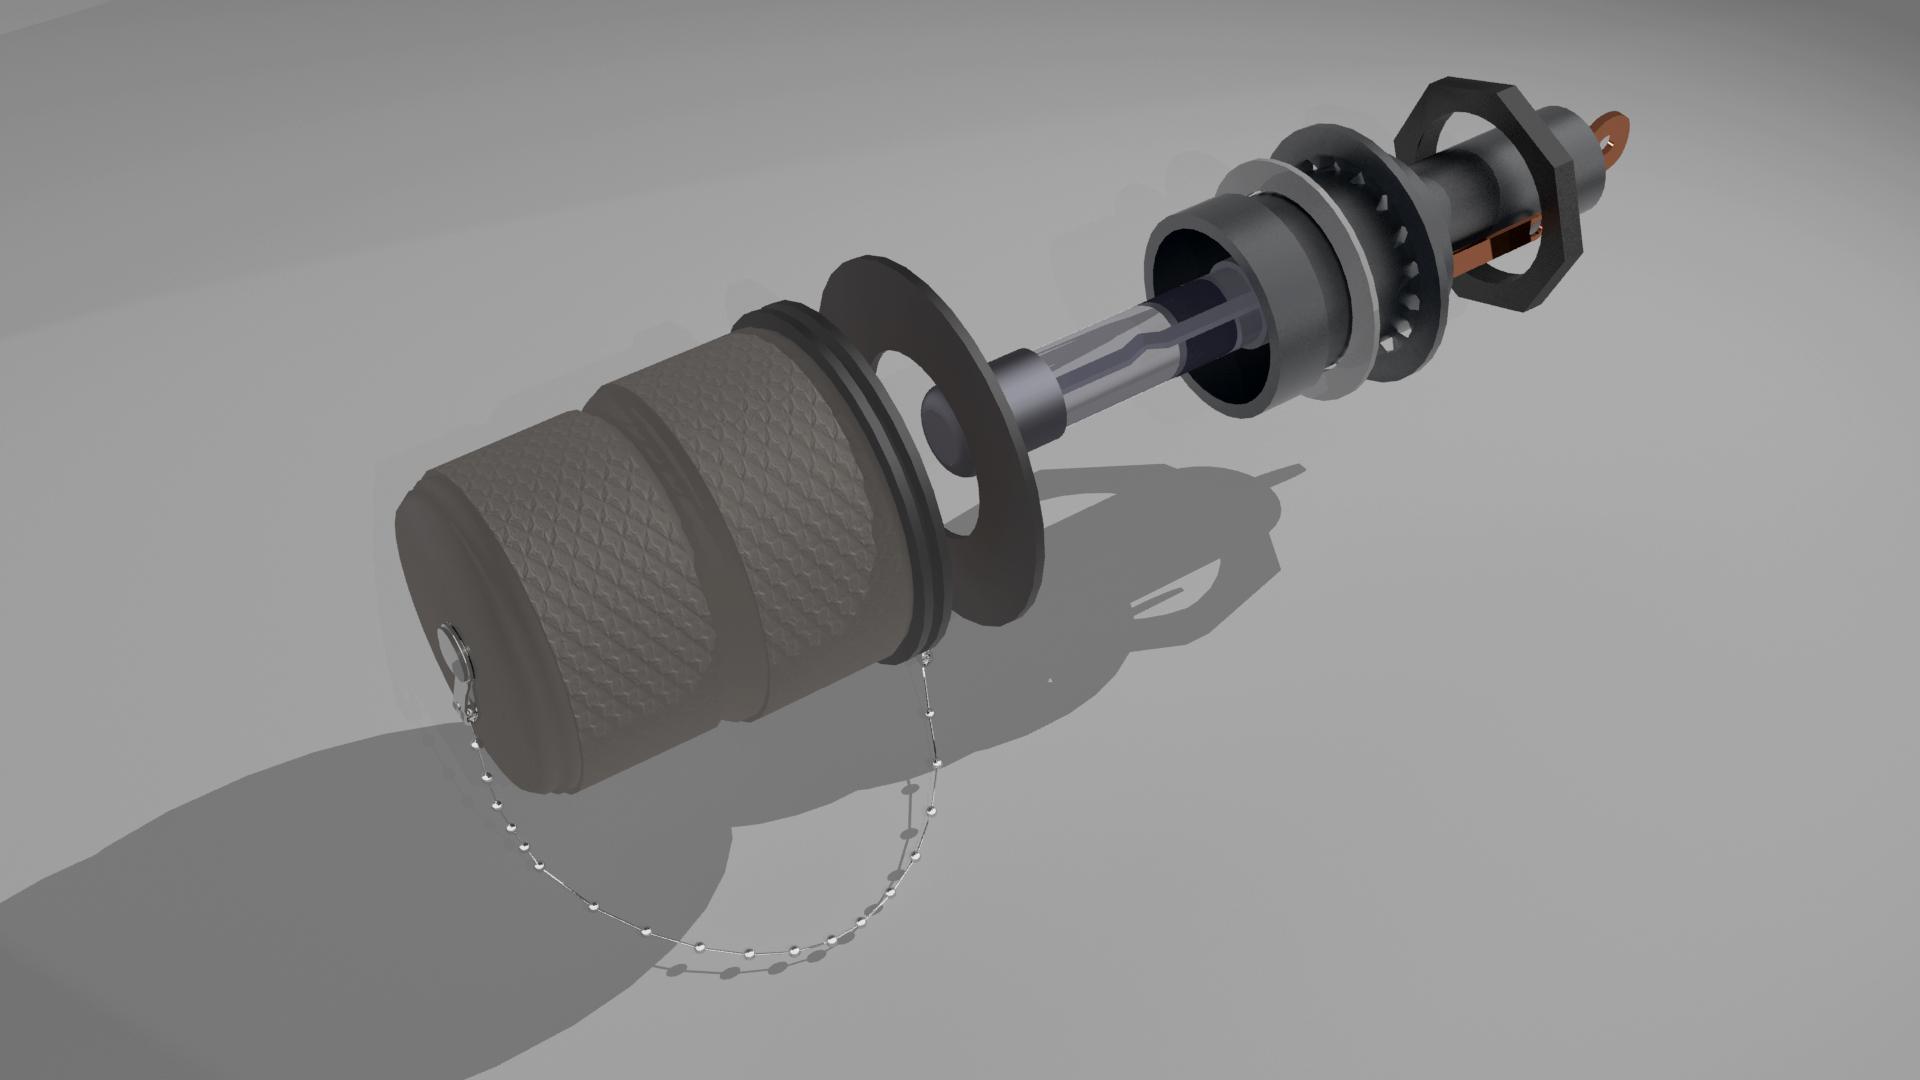 Fuze holder created in 3d studio max